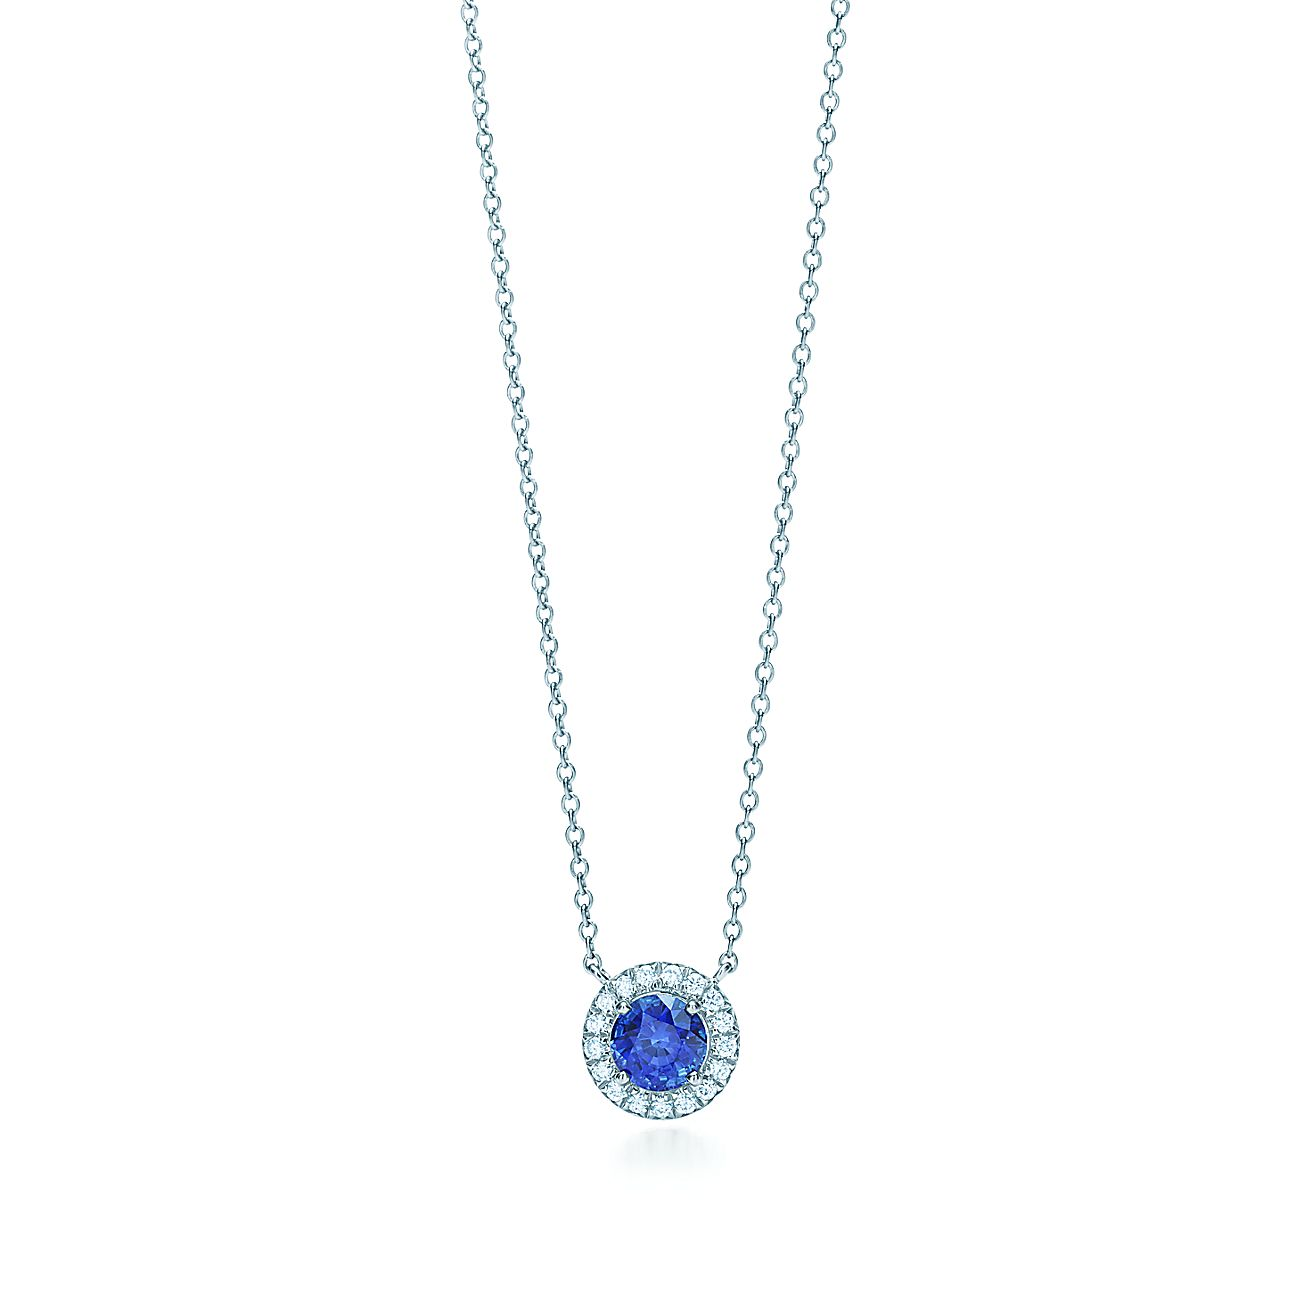 2fed736e4 Tiffany Soleste Pendant In Platinum With A Sapphire And Diamonds